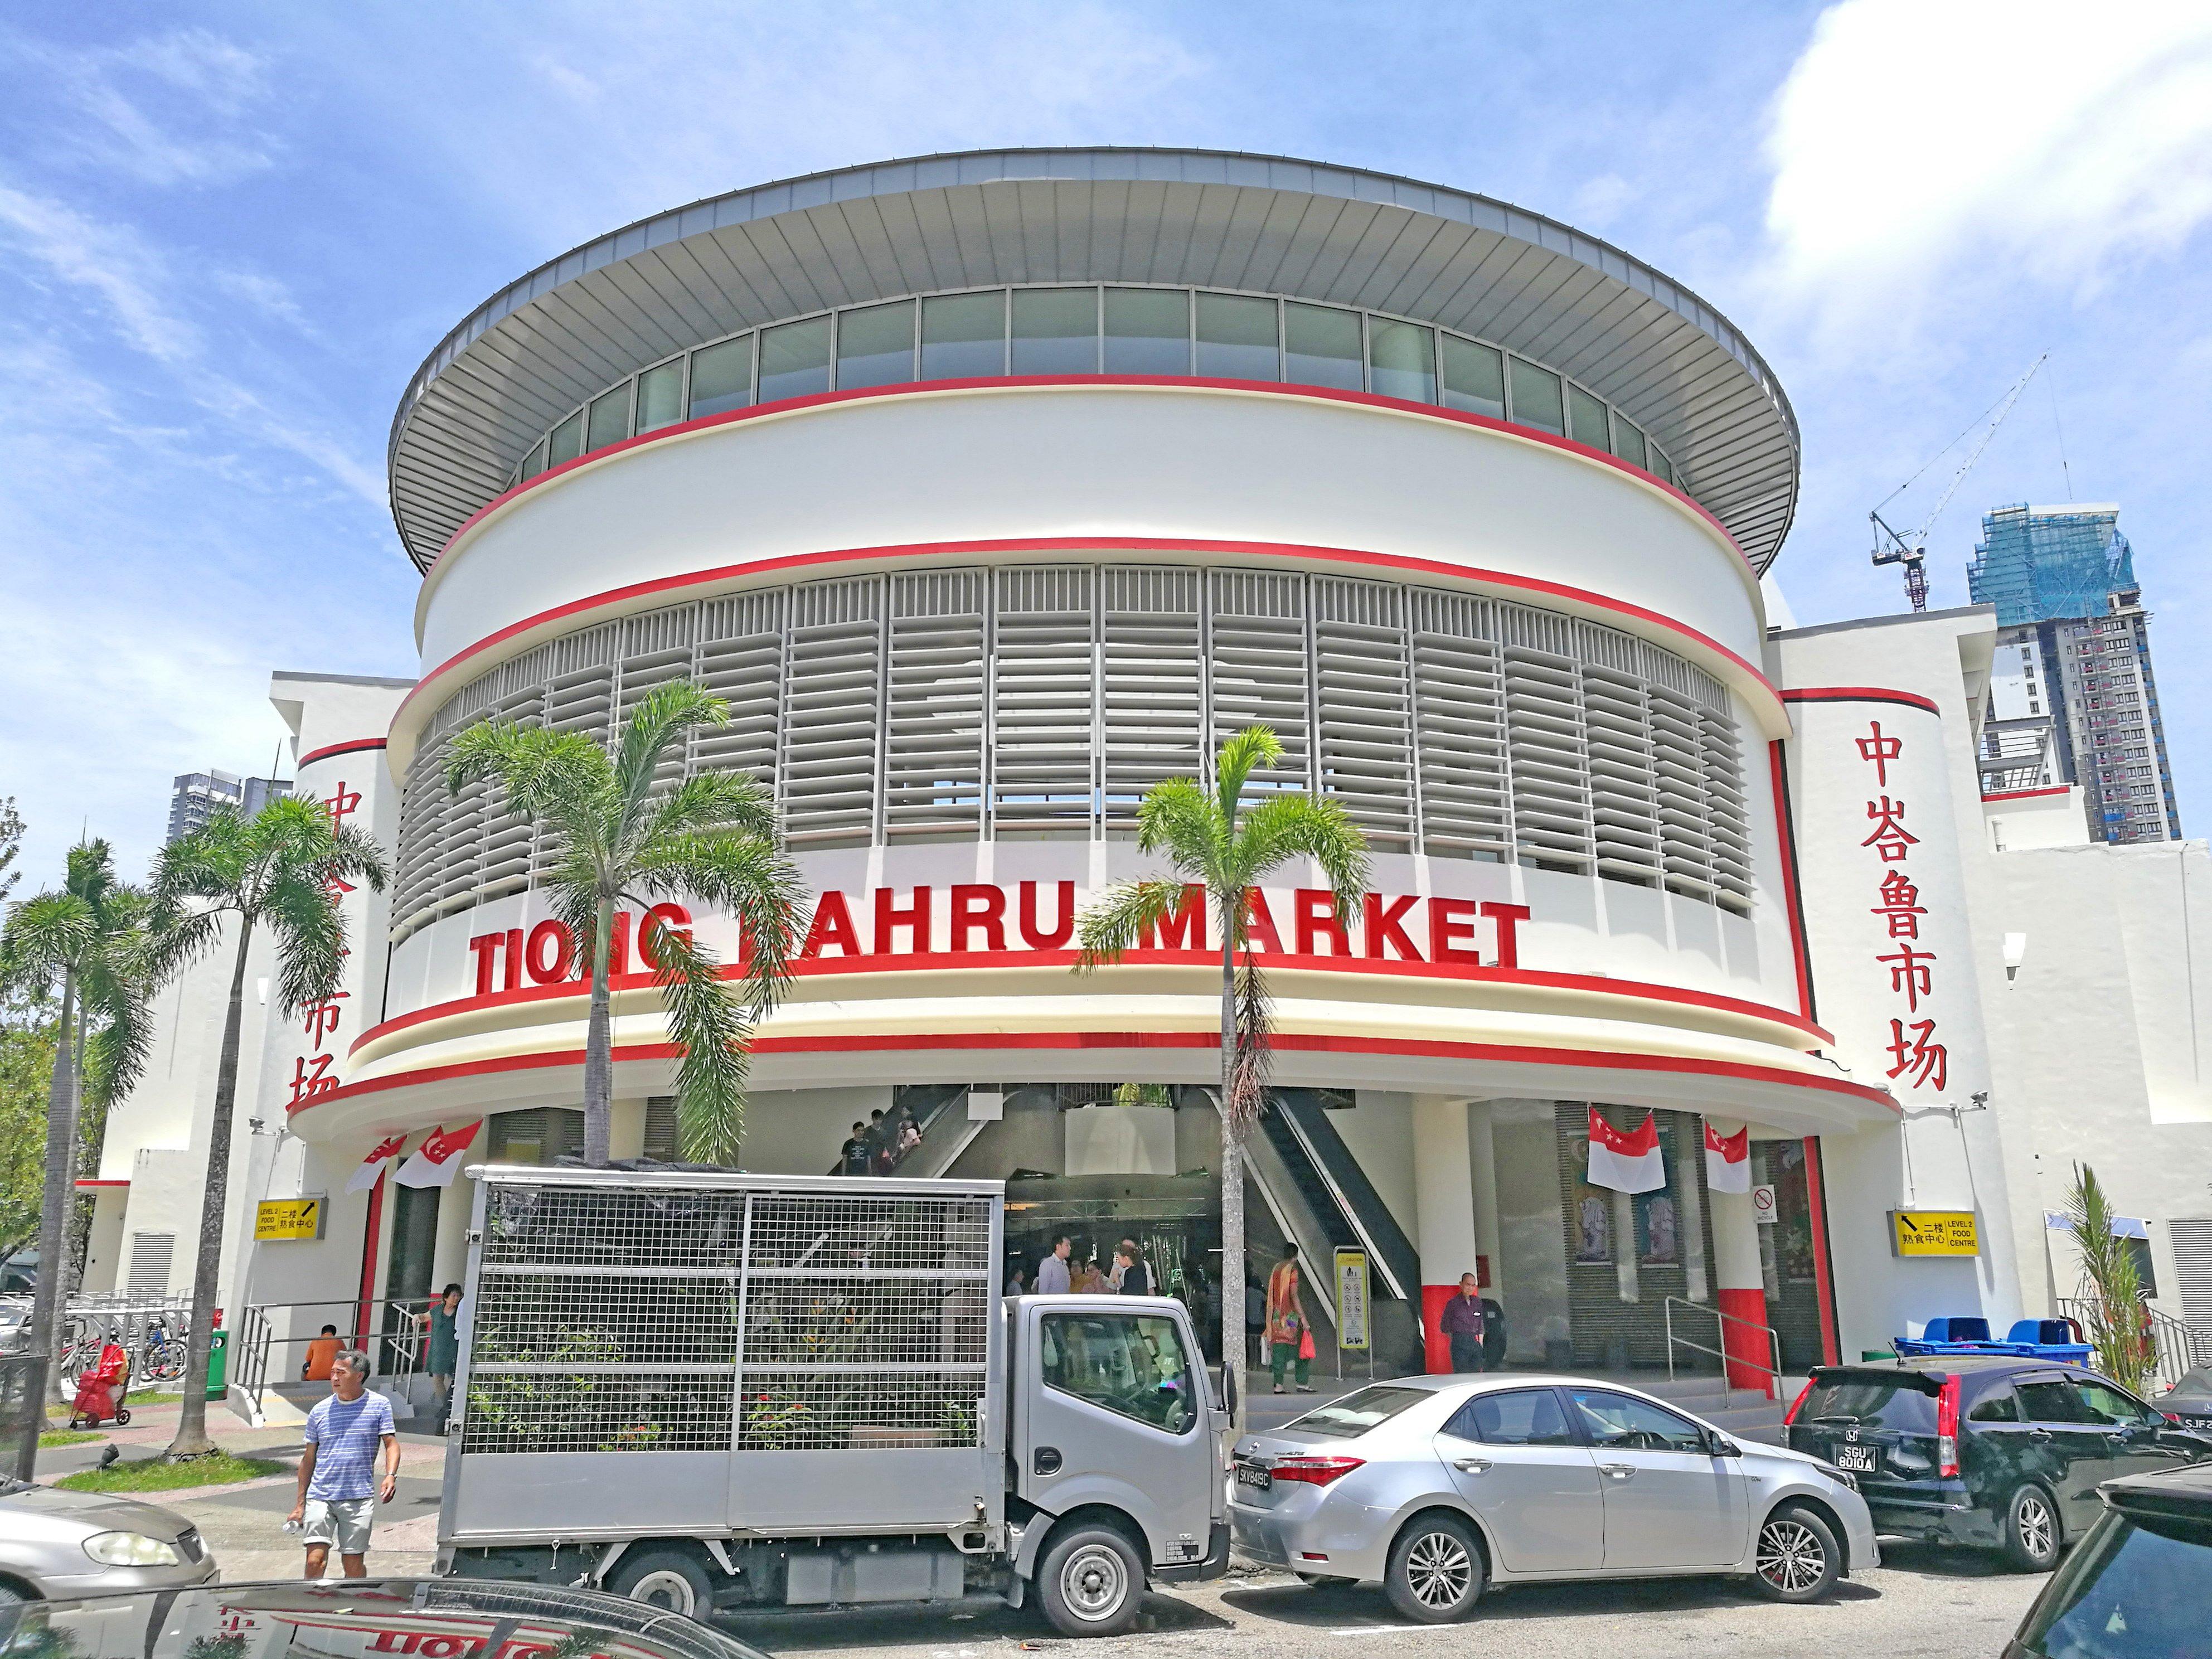 exterior of Tiong Bahru market